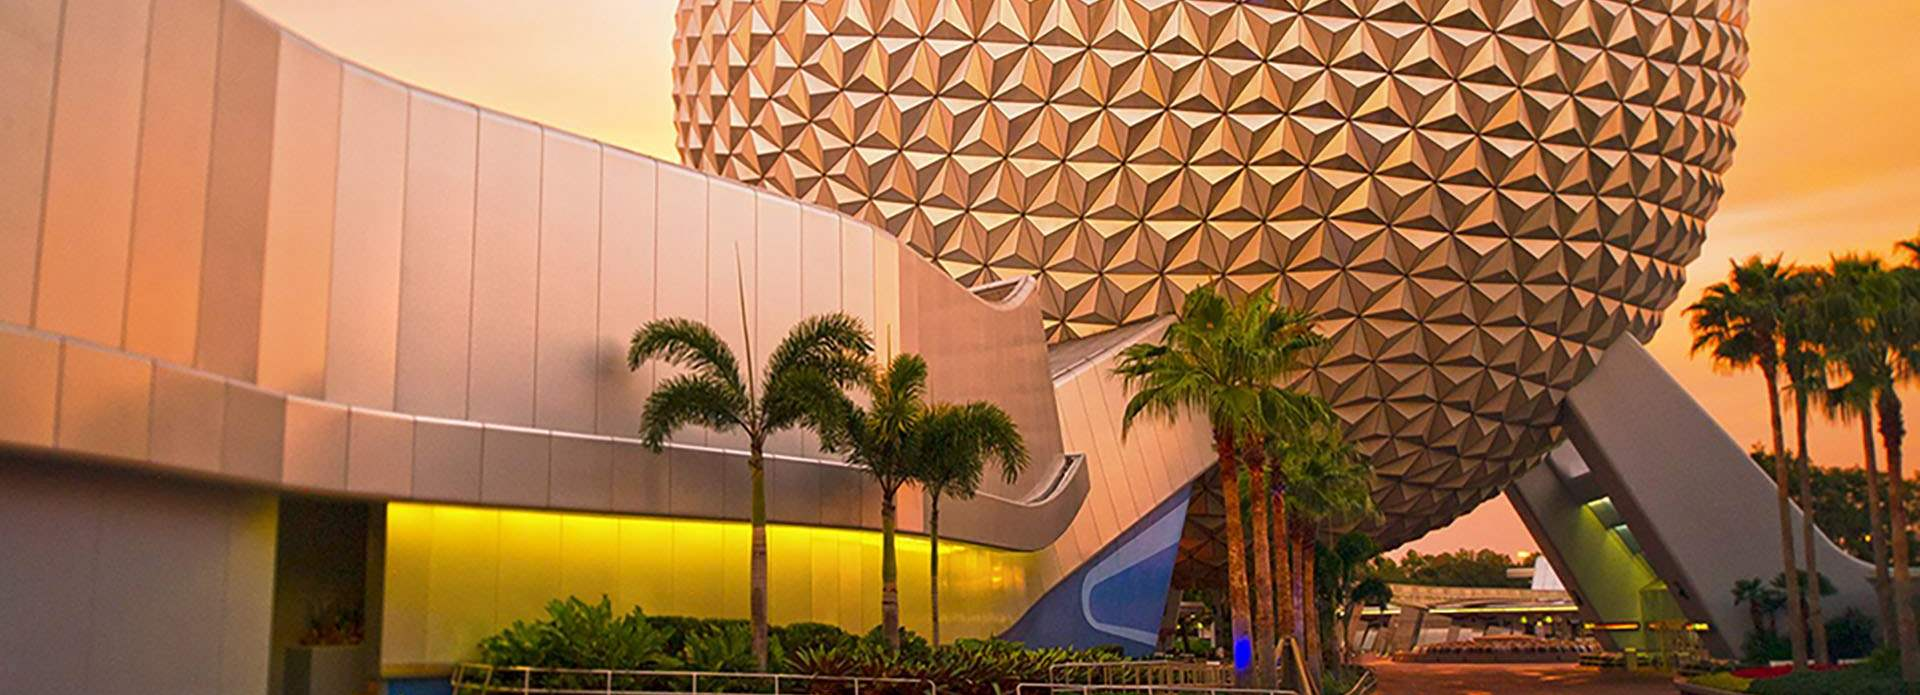 City View of Orlando, Florida Resort